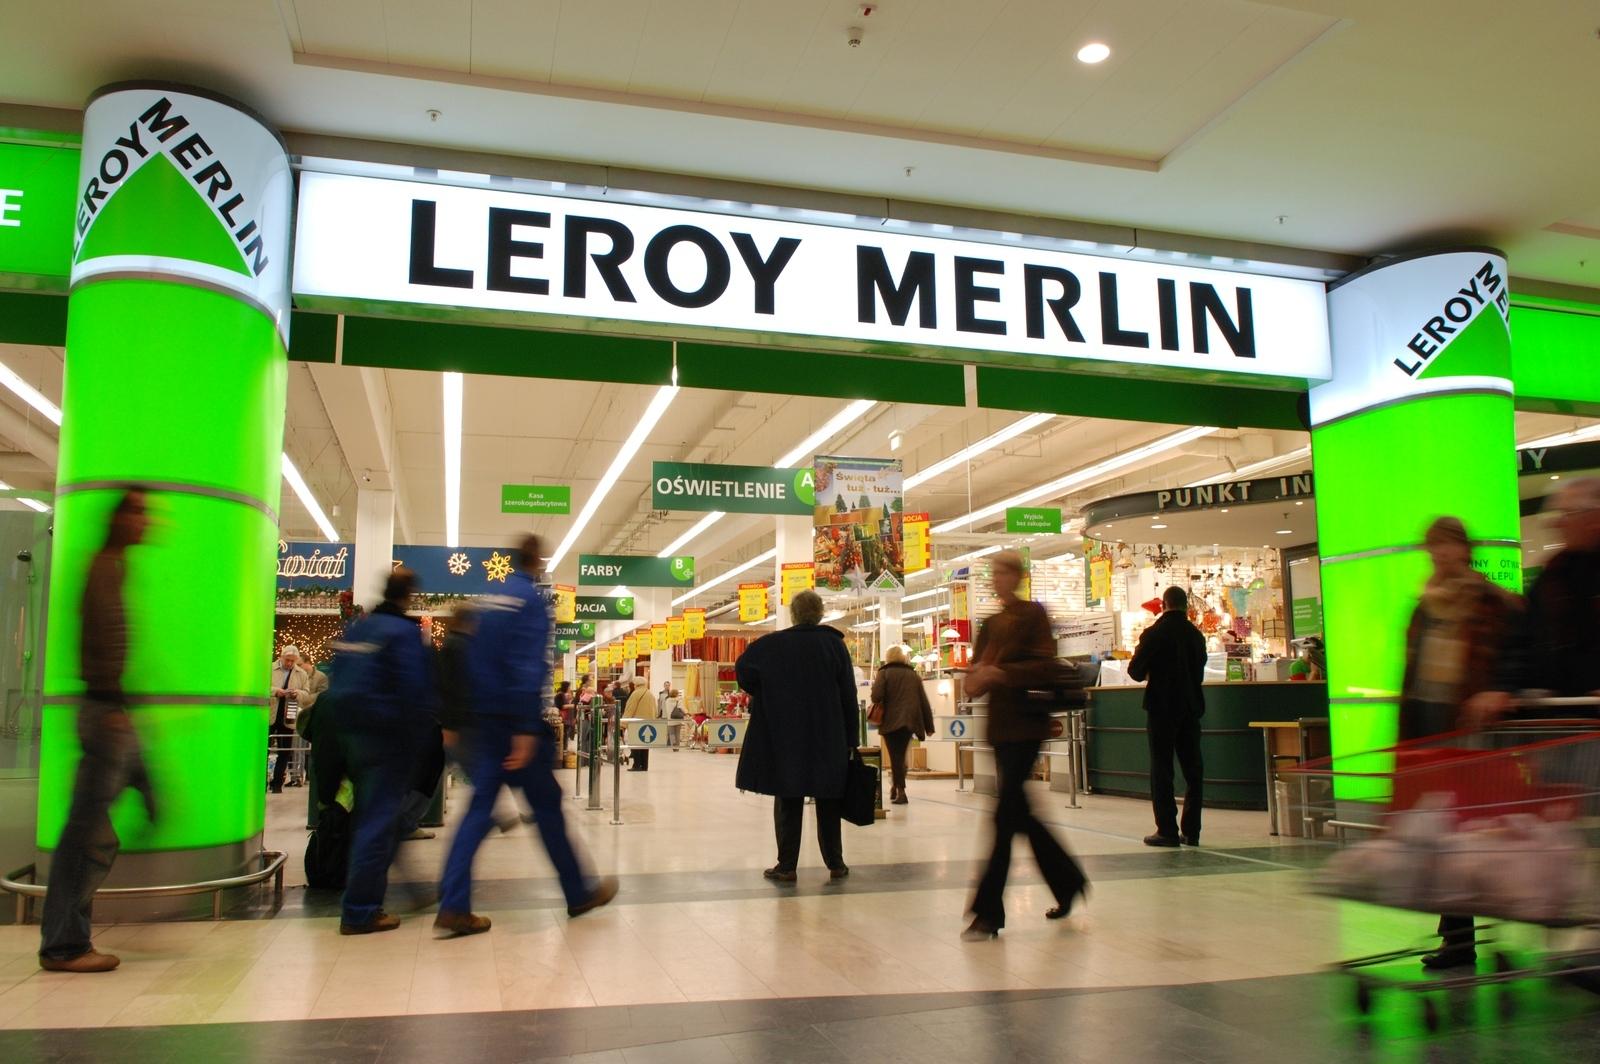 Leroy Merlin novas vagas de emprego 2018